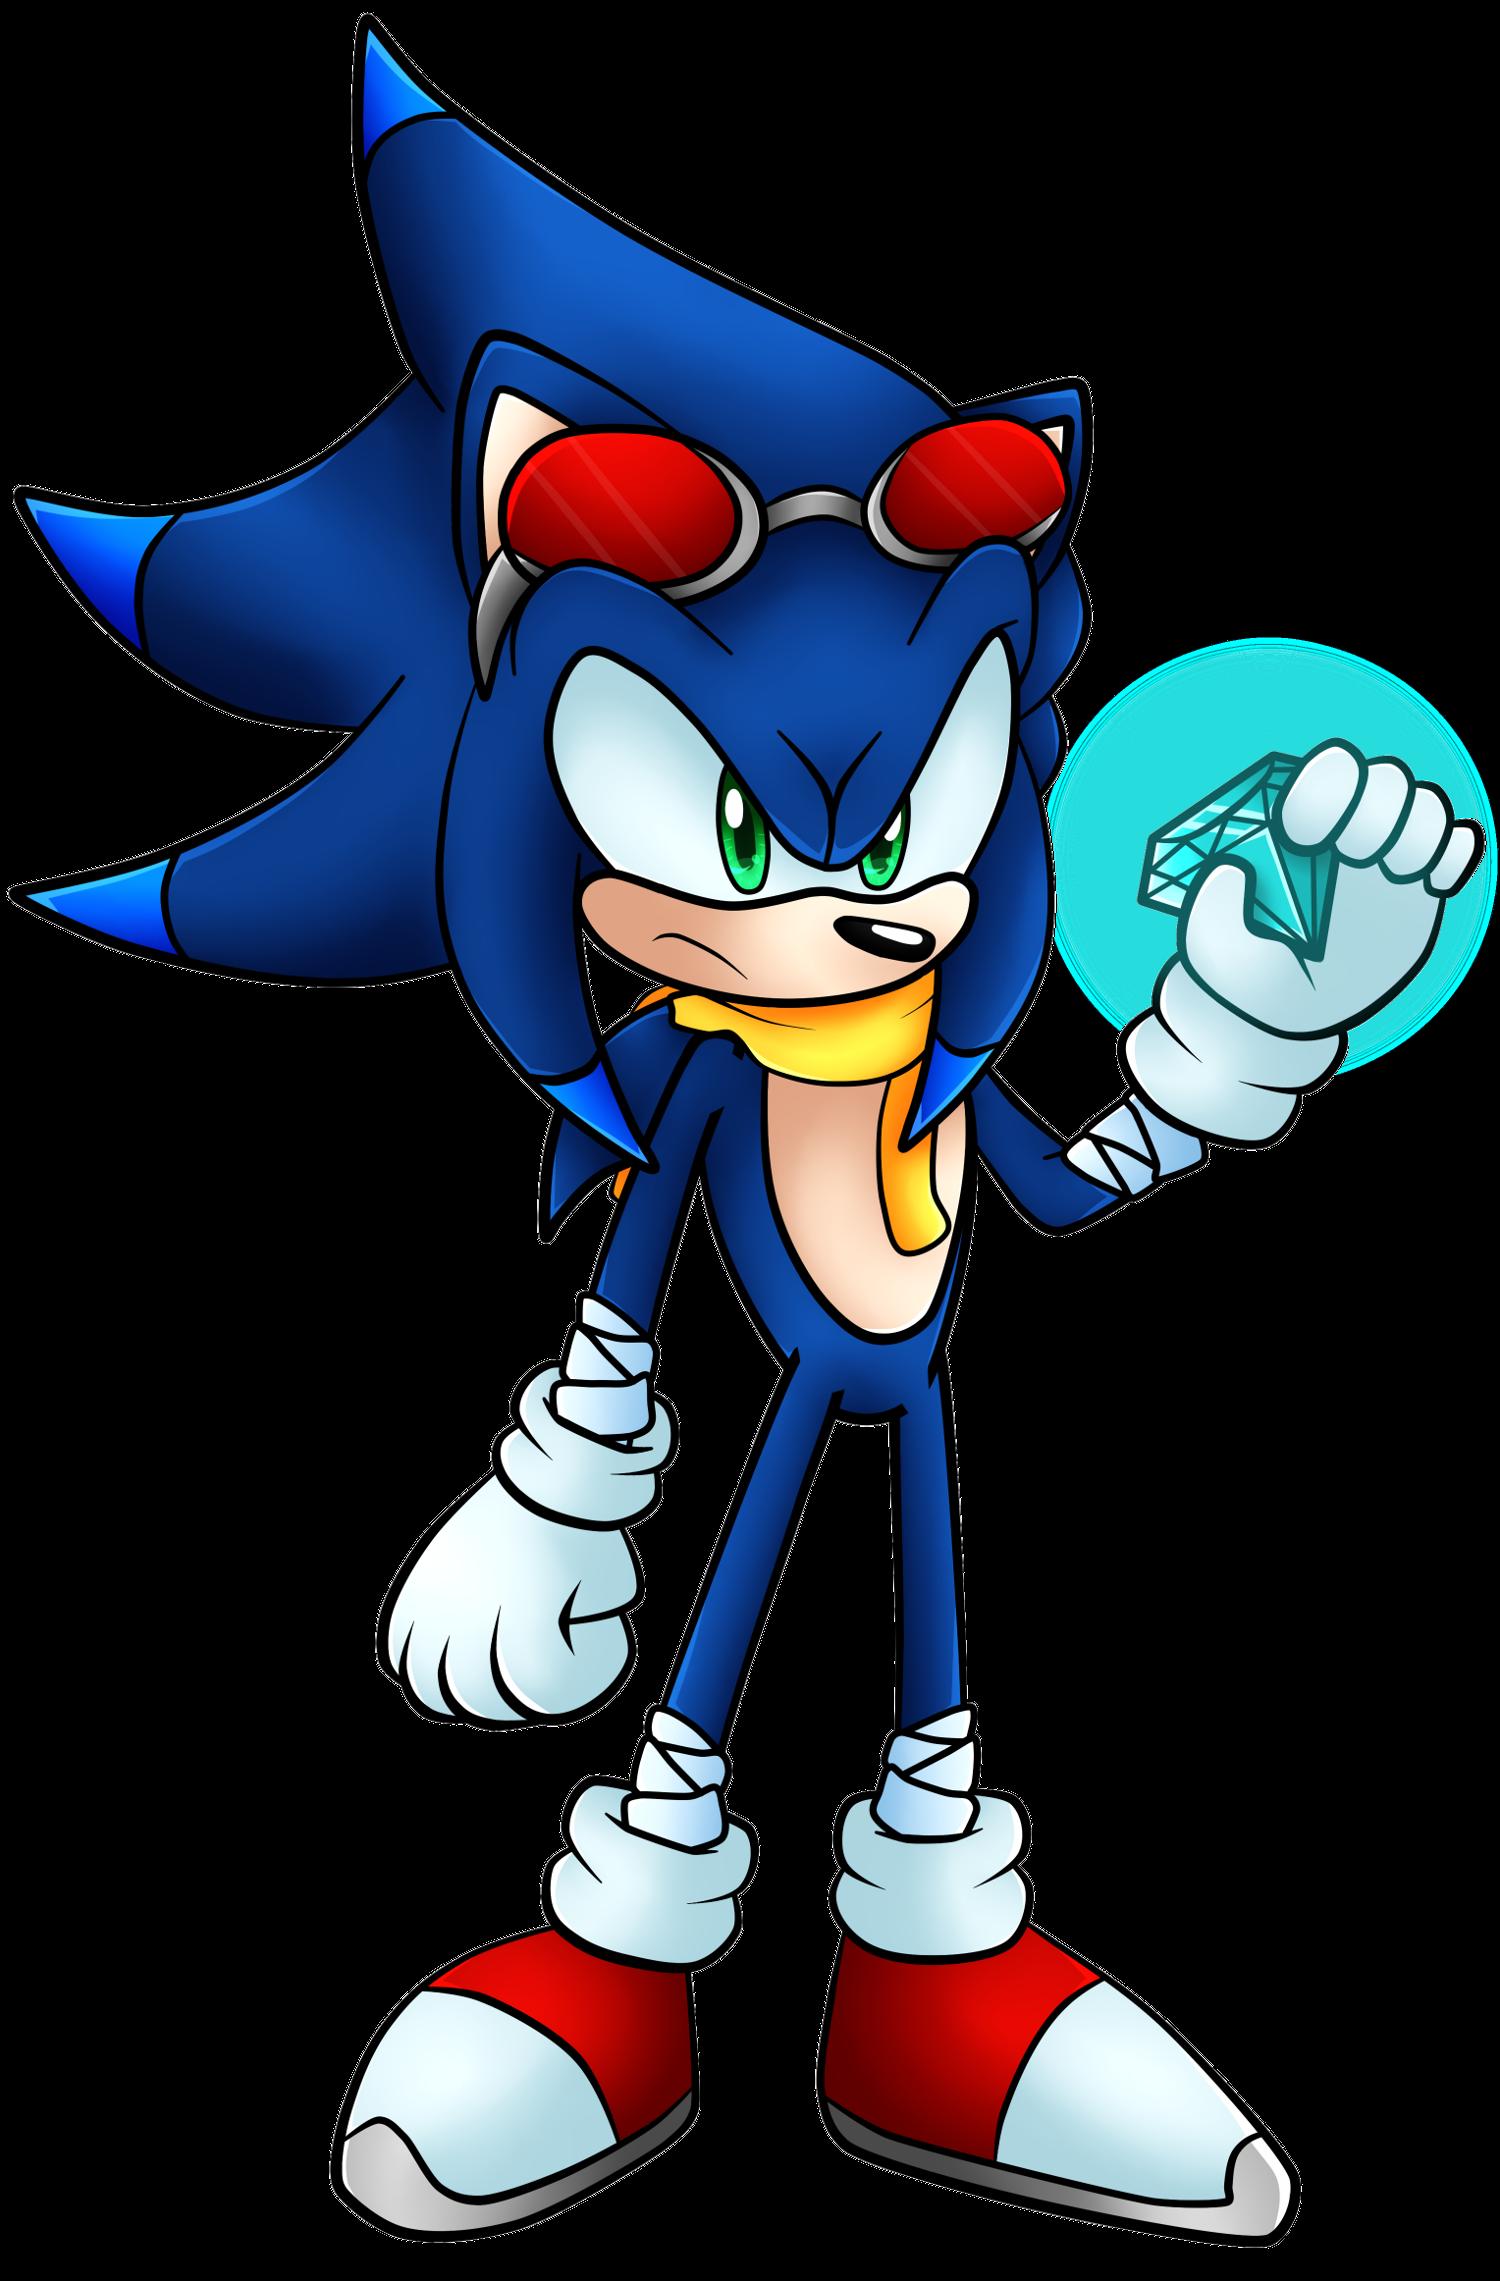 Trident The Hedgehog